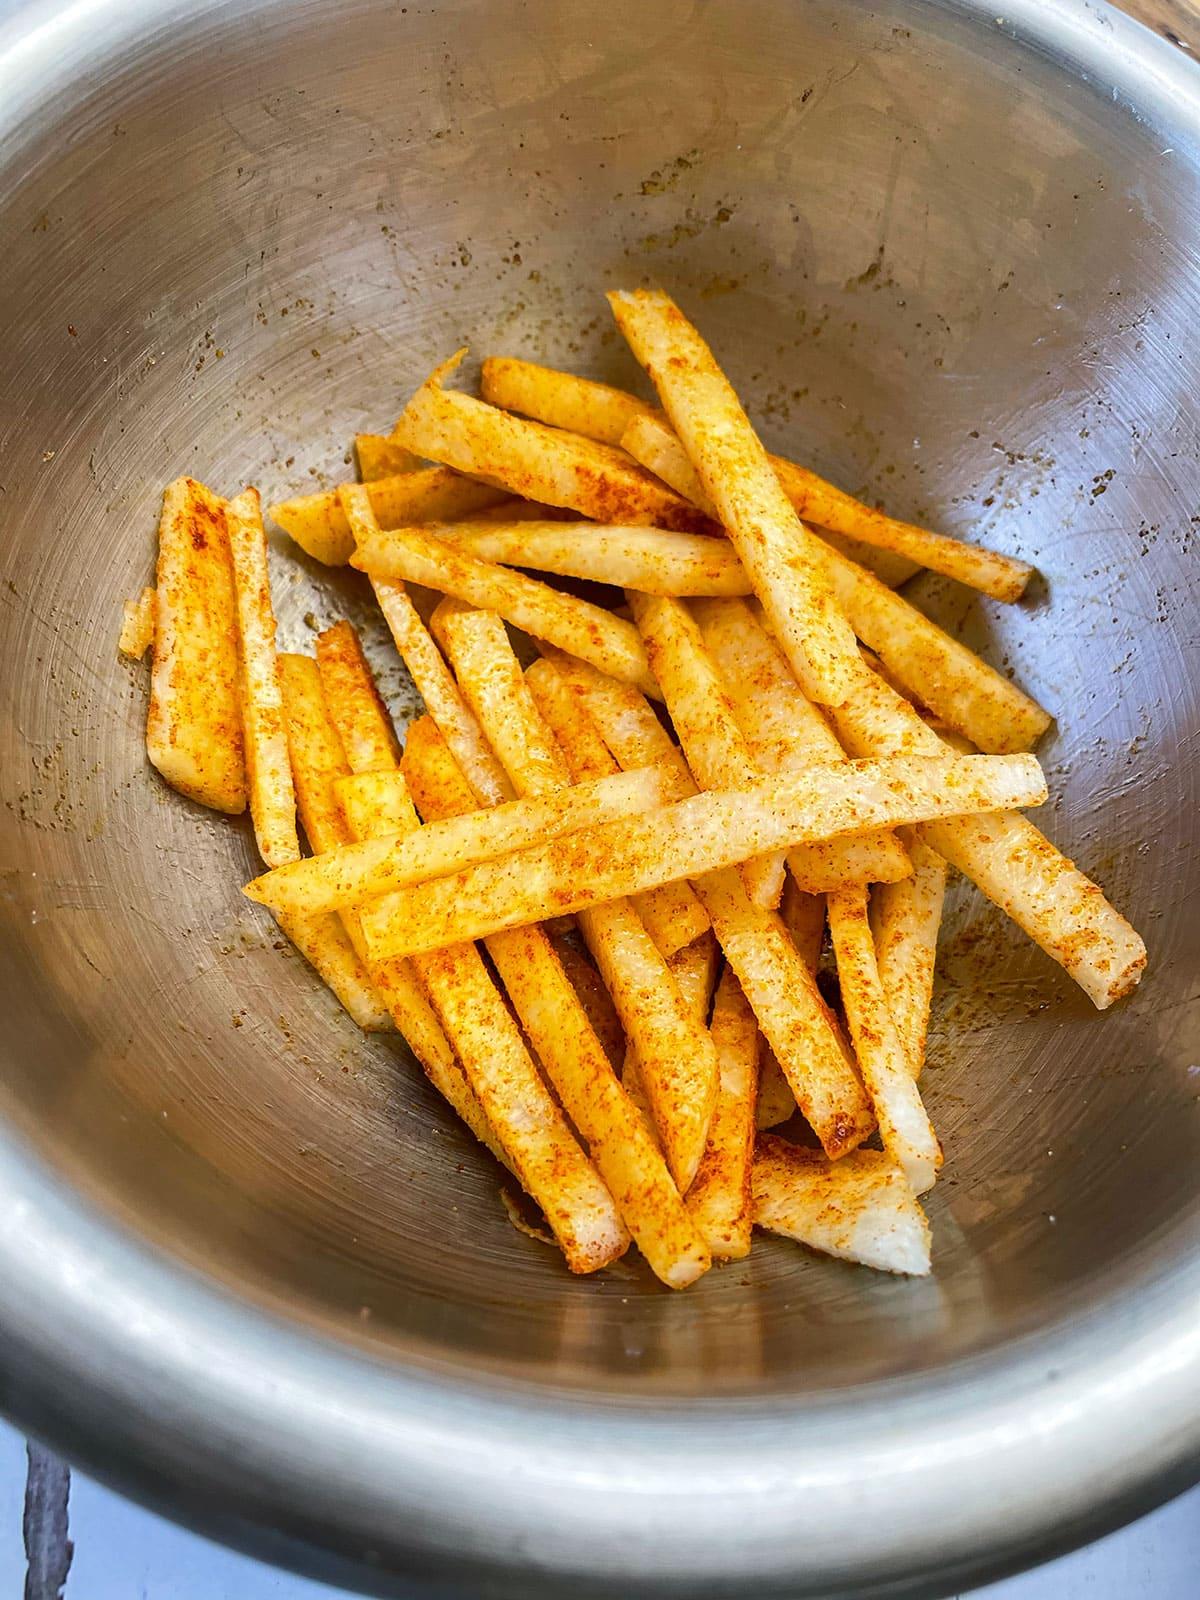 jicama fries seasoned